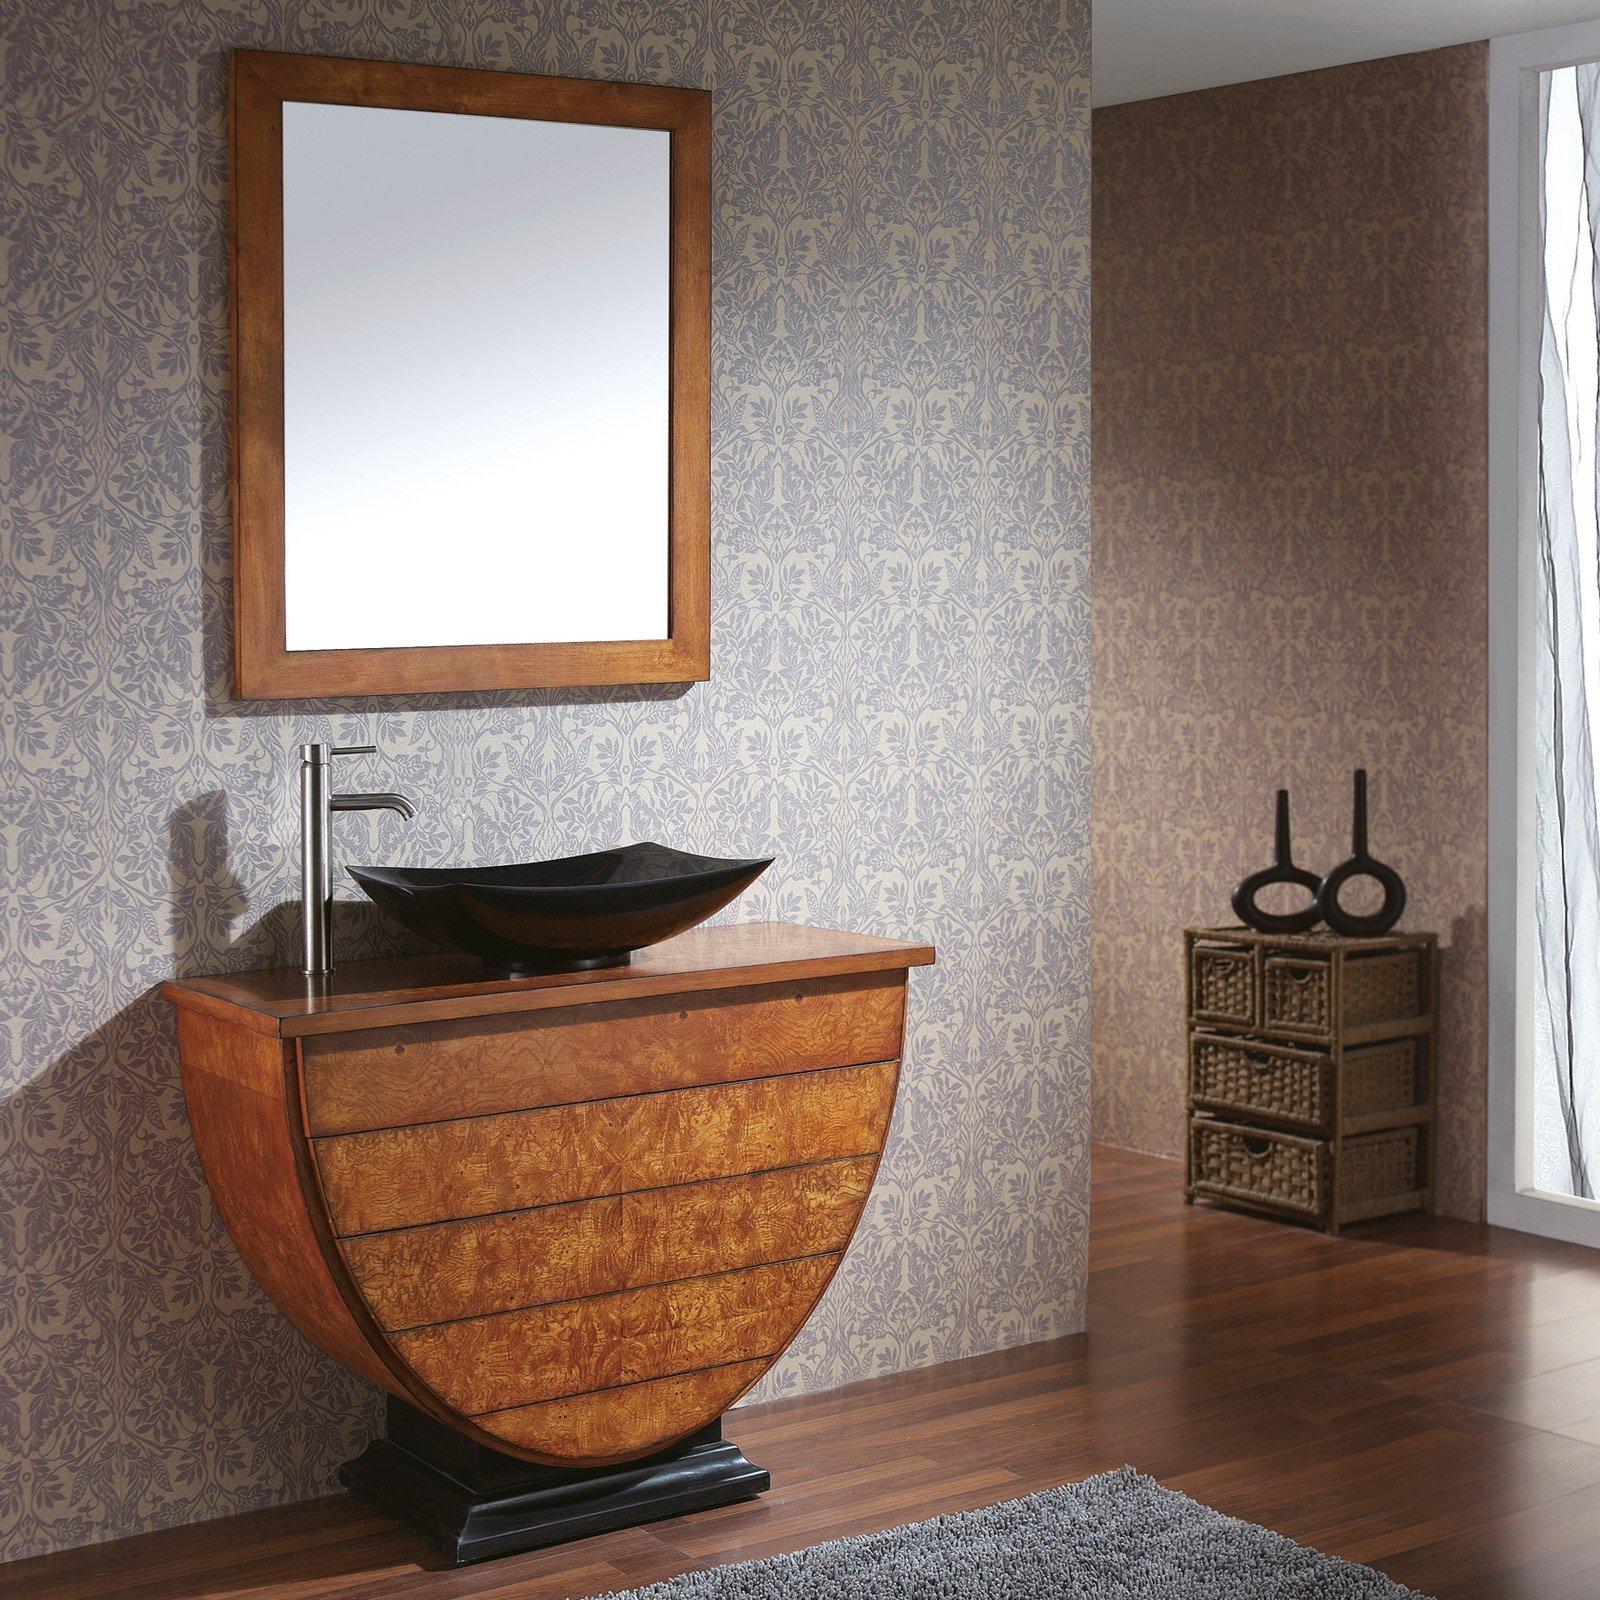 Avanity LEGACY-V40-BU Legacy 40-in. Golden Burl Single Bathroom Vanity with Optional Vessel